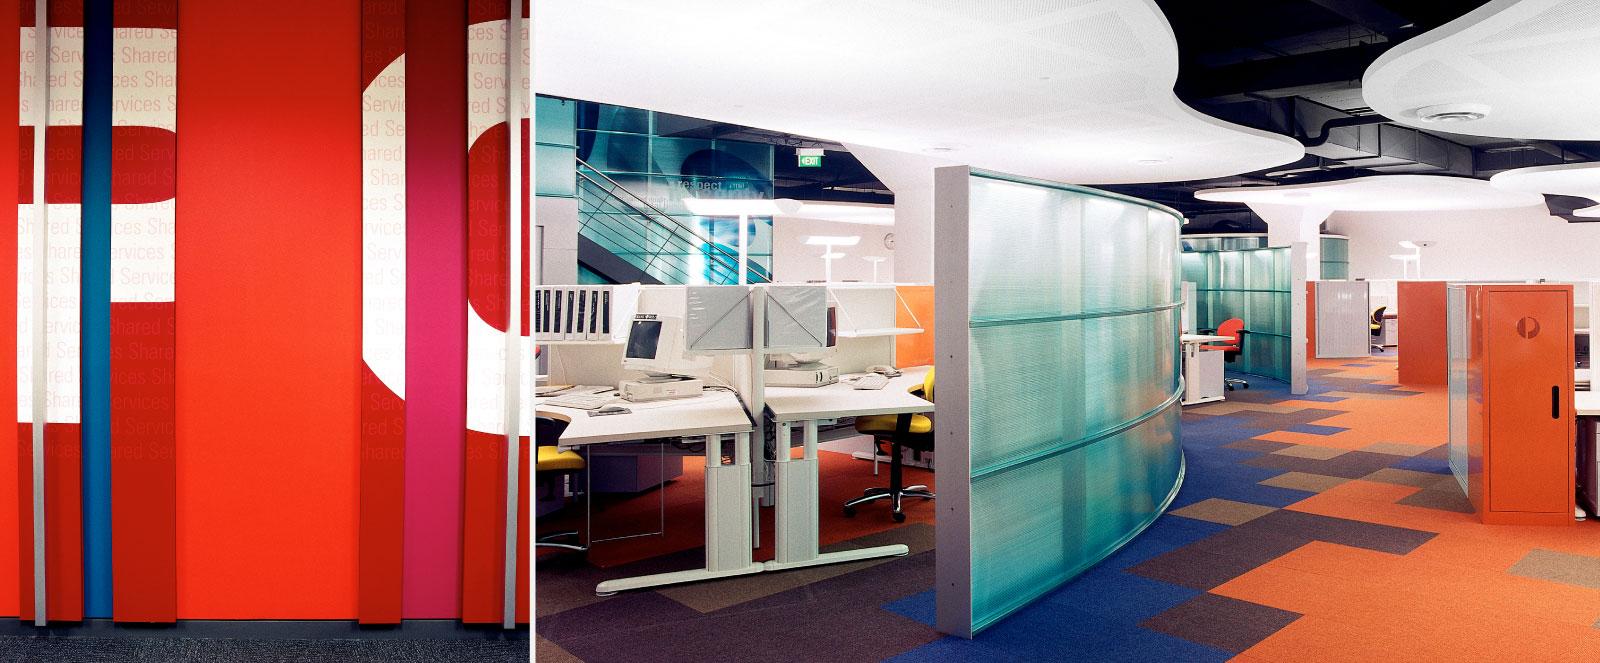 H2o-Architects-Melbourne-Australia-Post-Ground-Up-03